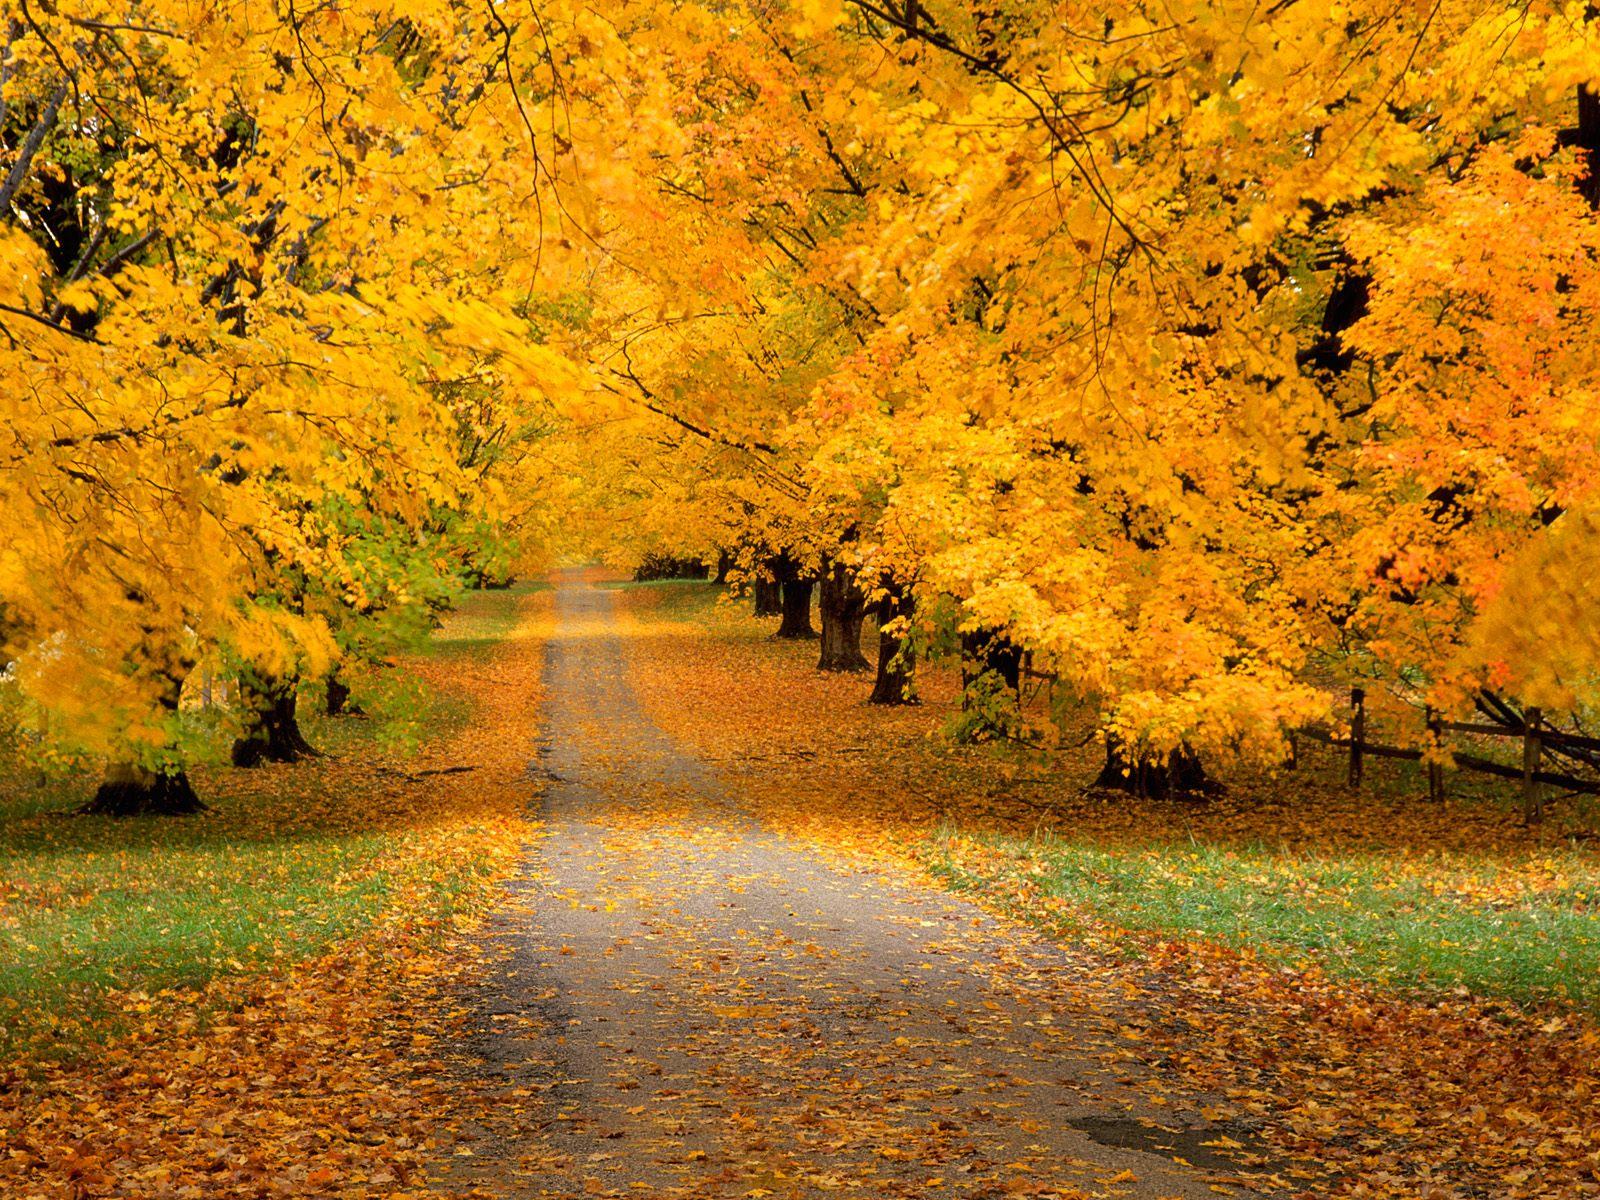 beautiful autumn season wallpaper hd beautiful autumn season wallpaper 1600x1200